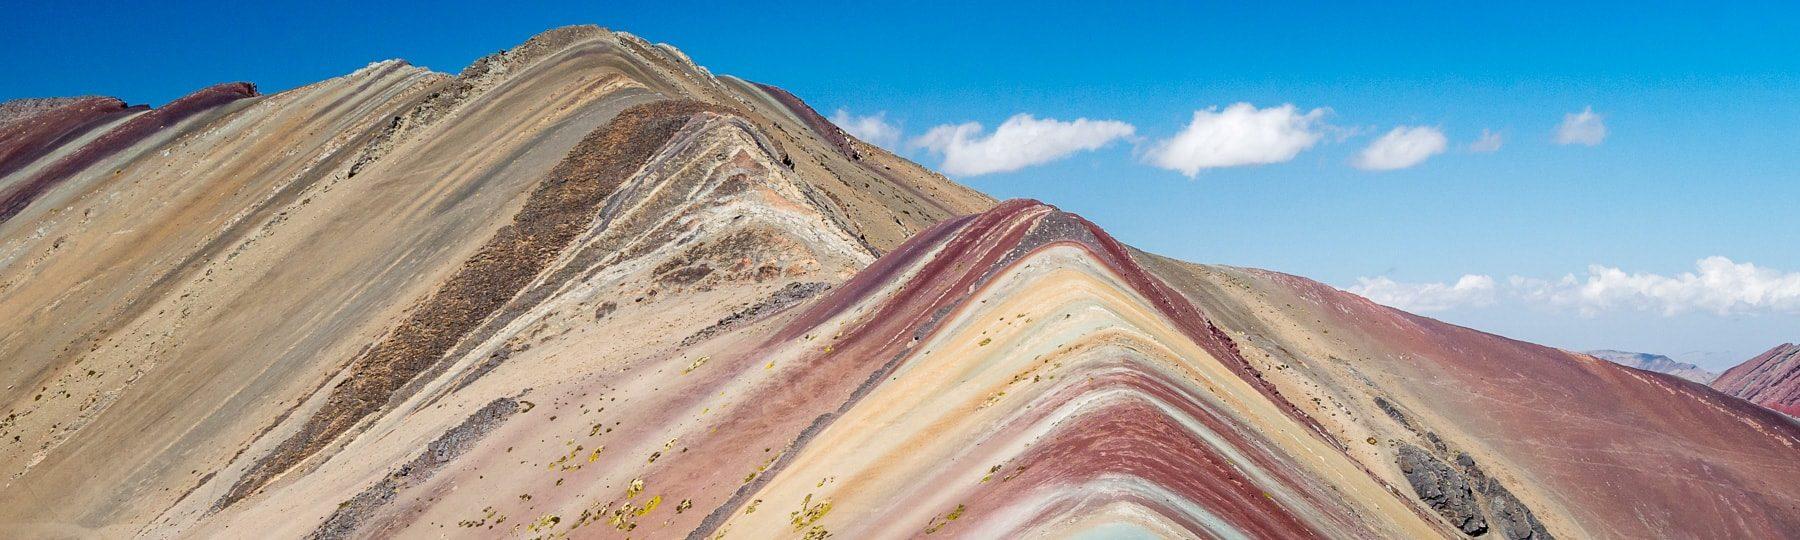 Rainbow Mountain Peru Cusco